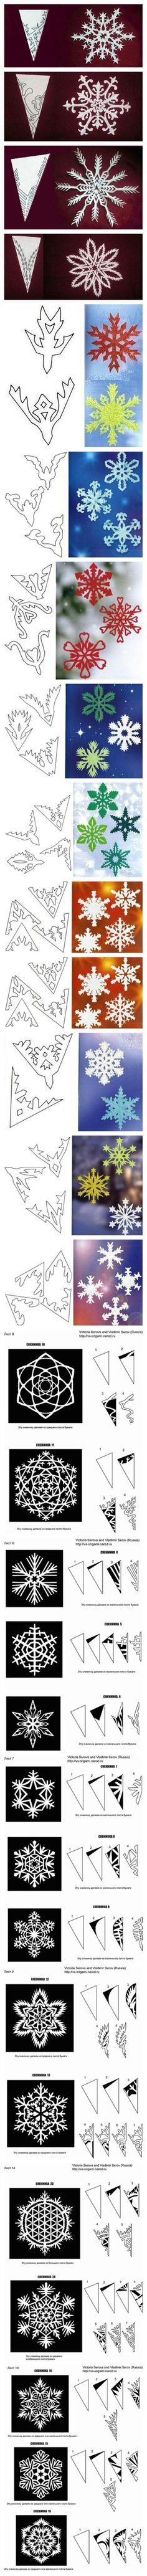 snowflakes by AmandaGustin